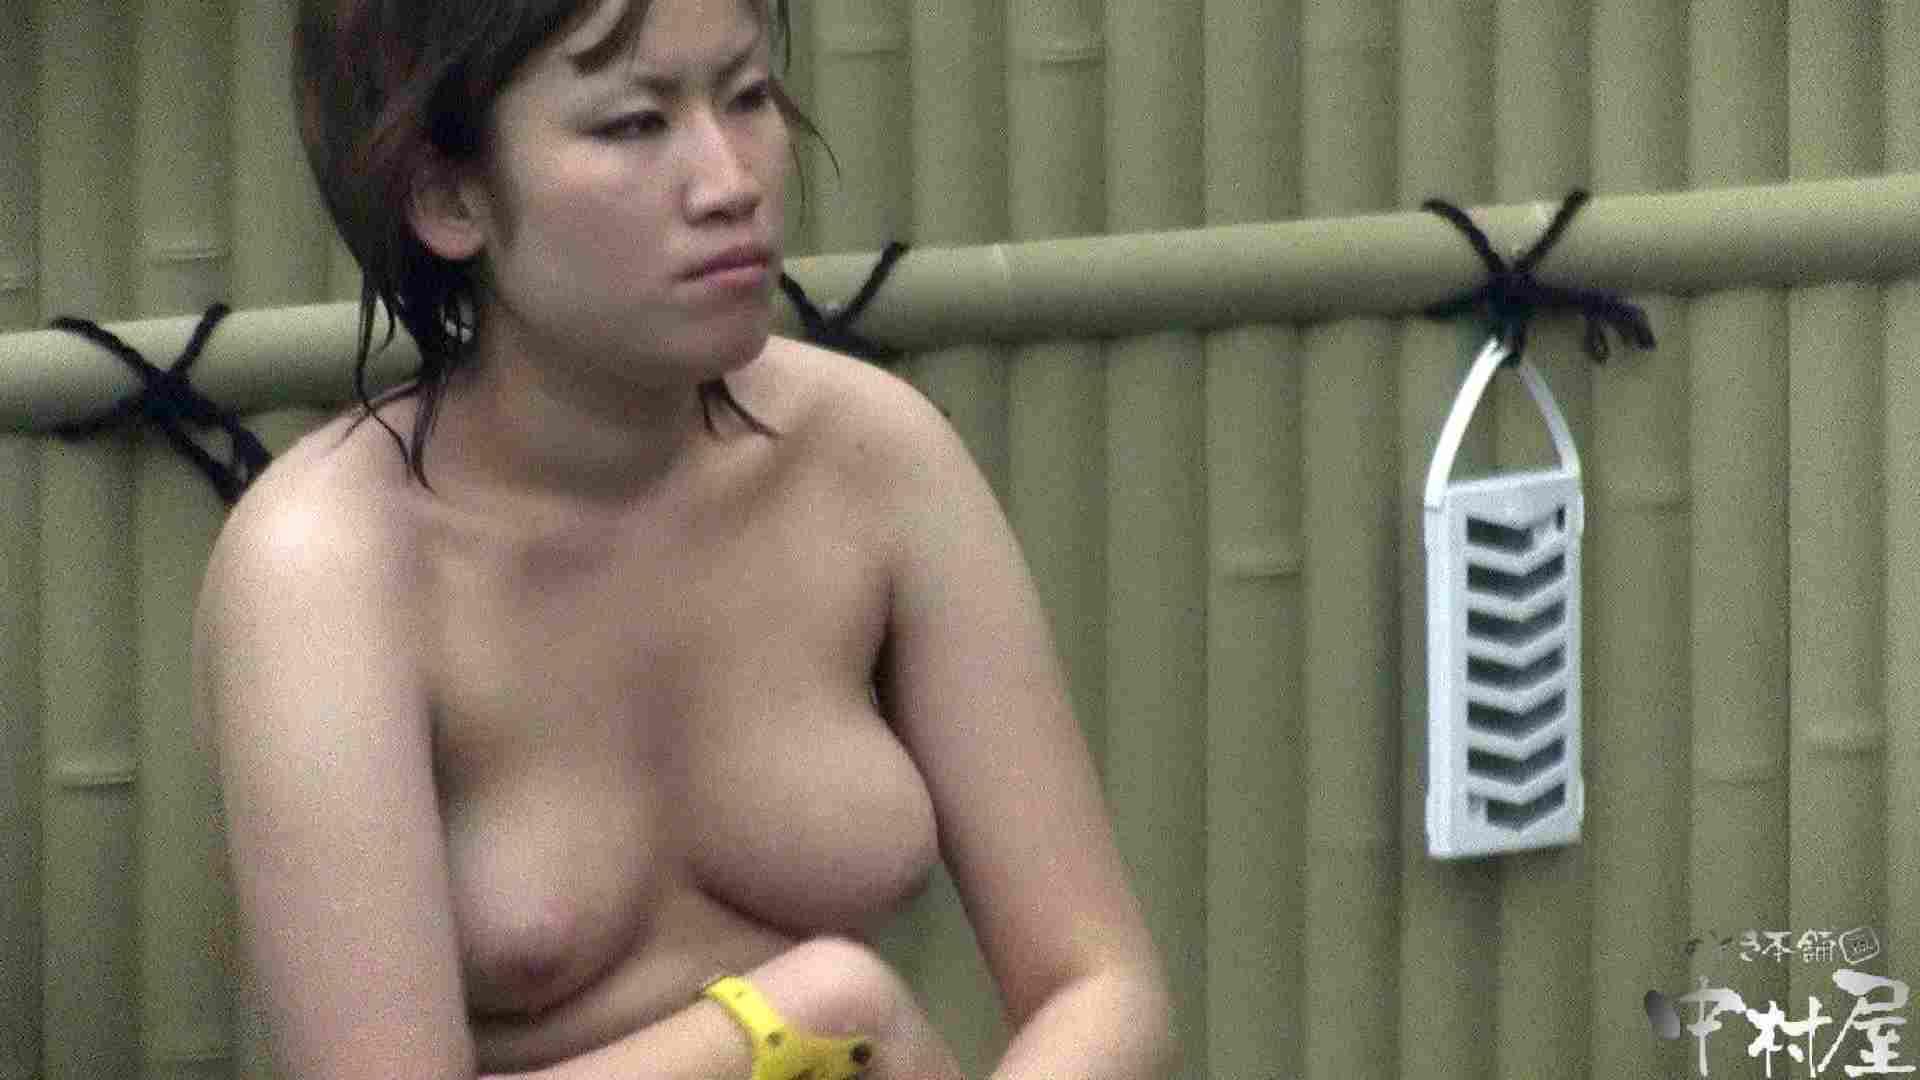 Aquaな露天風呂Vol.918 盗撮特撮 おまんこ動画流出 11pic 8